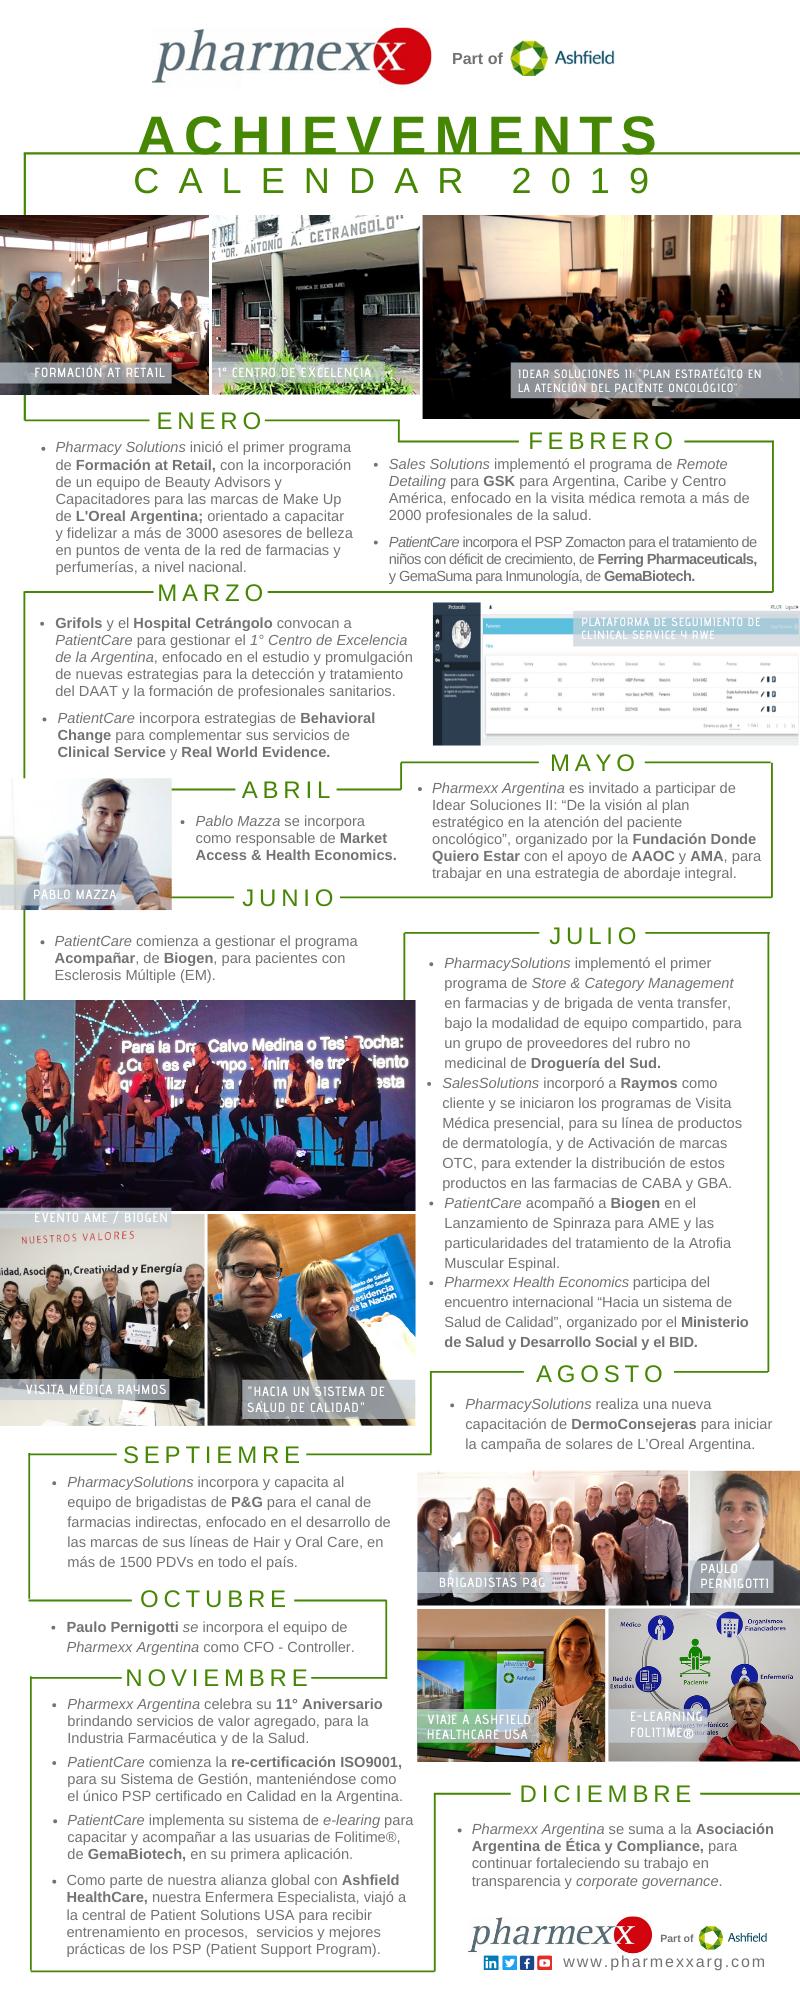 Pharmexx Argentina Achivements Calendar 2019